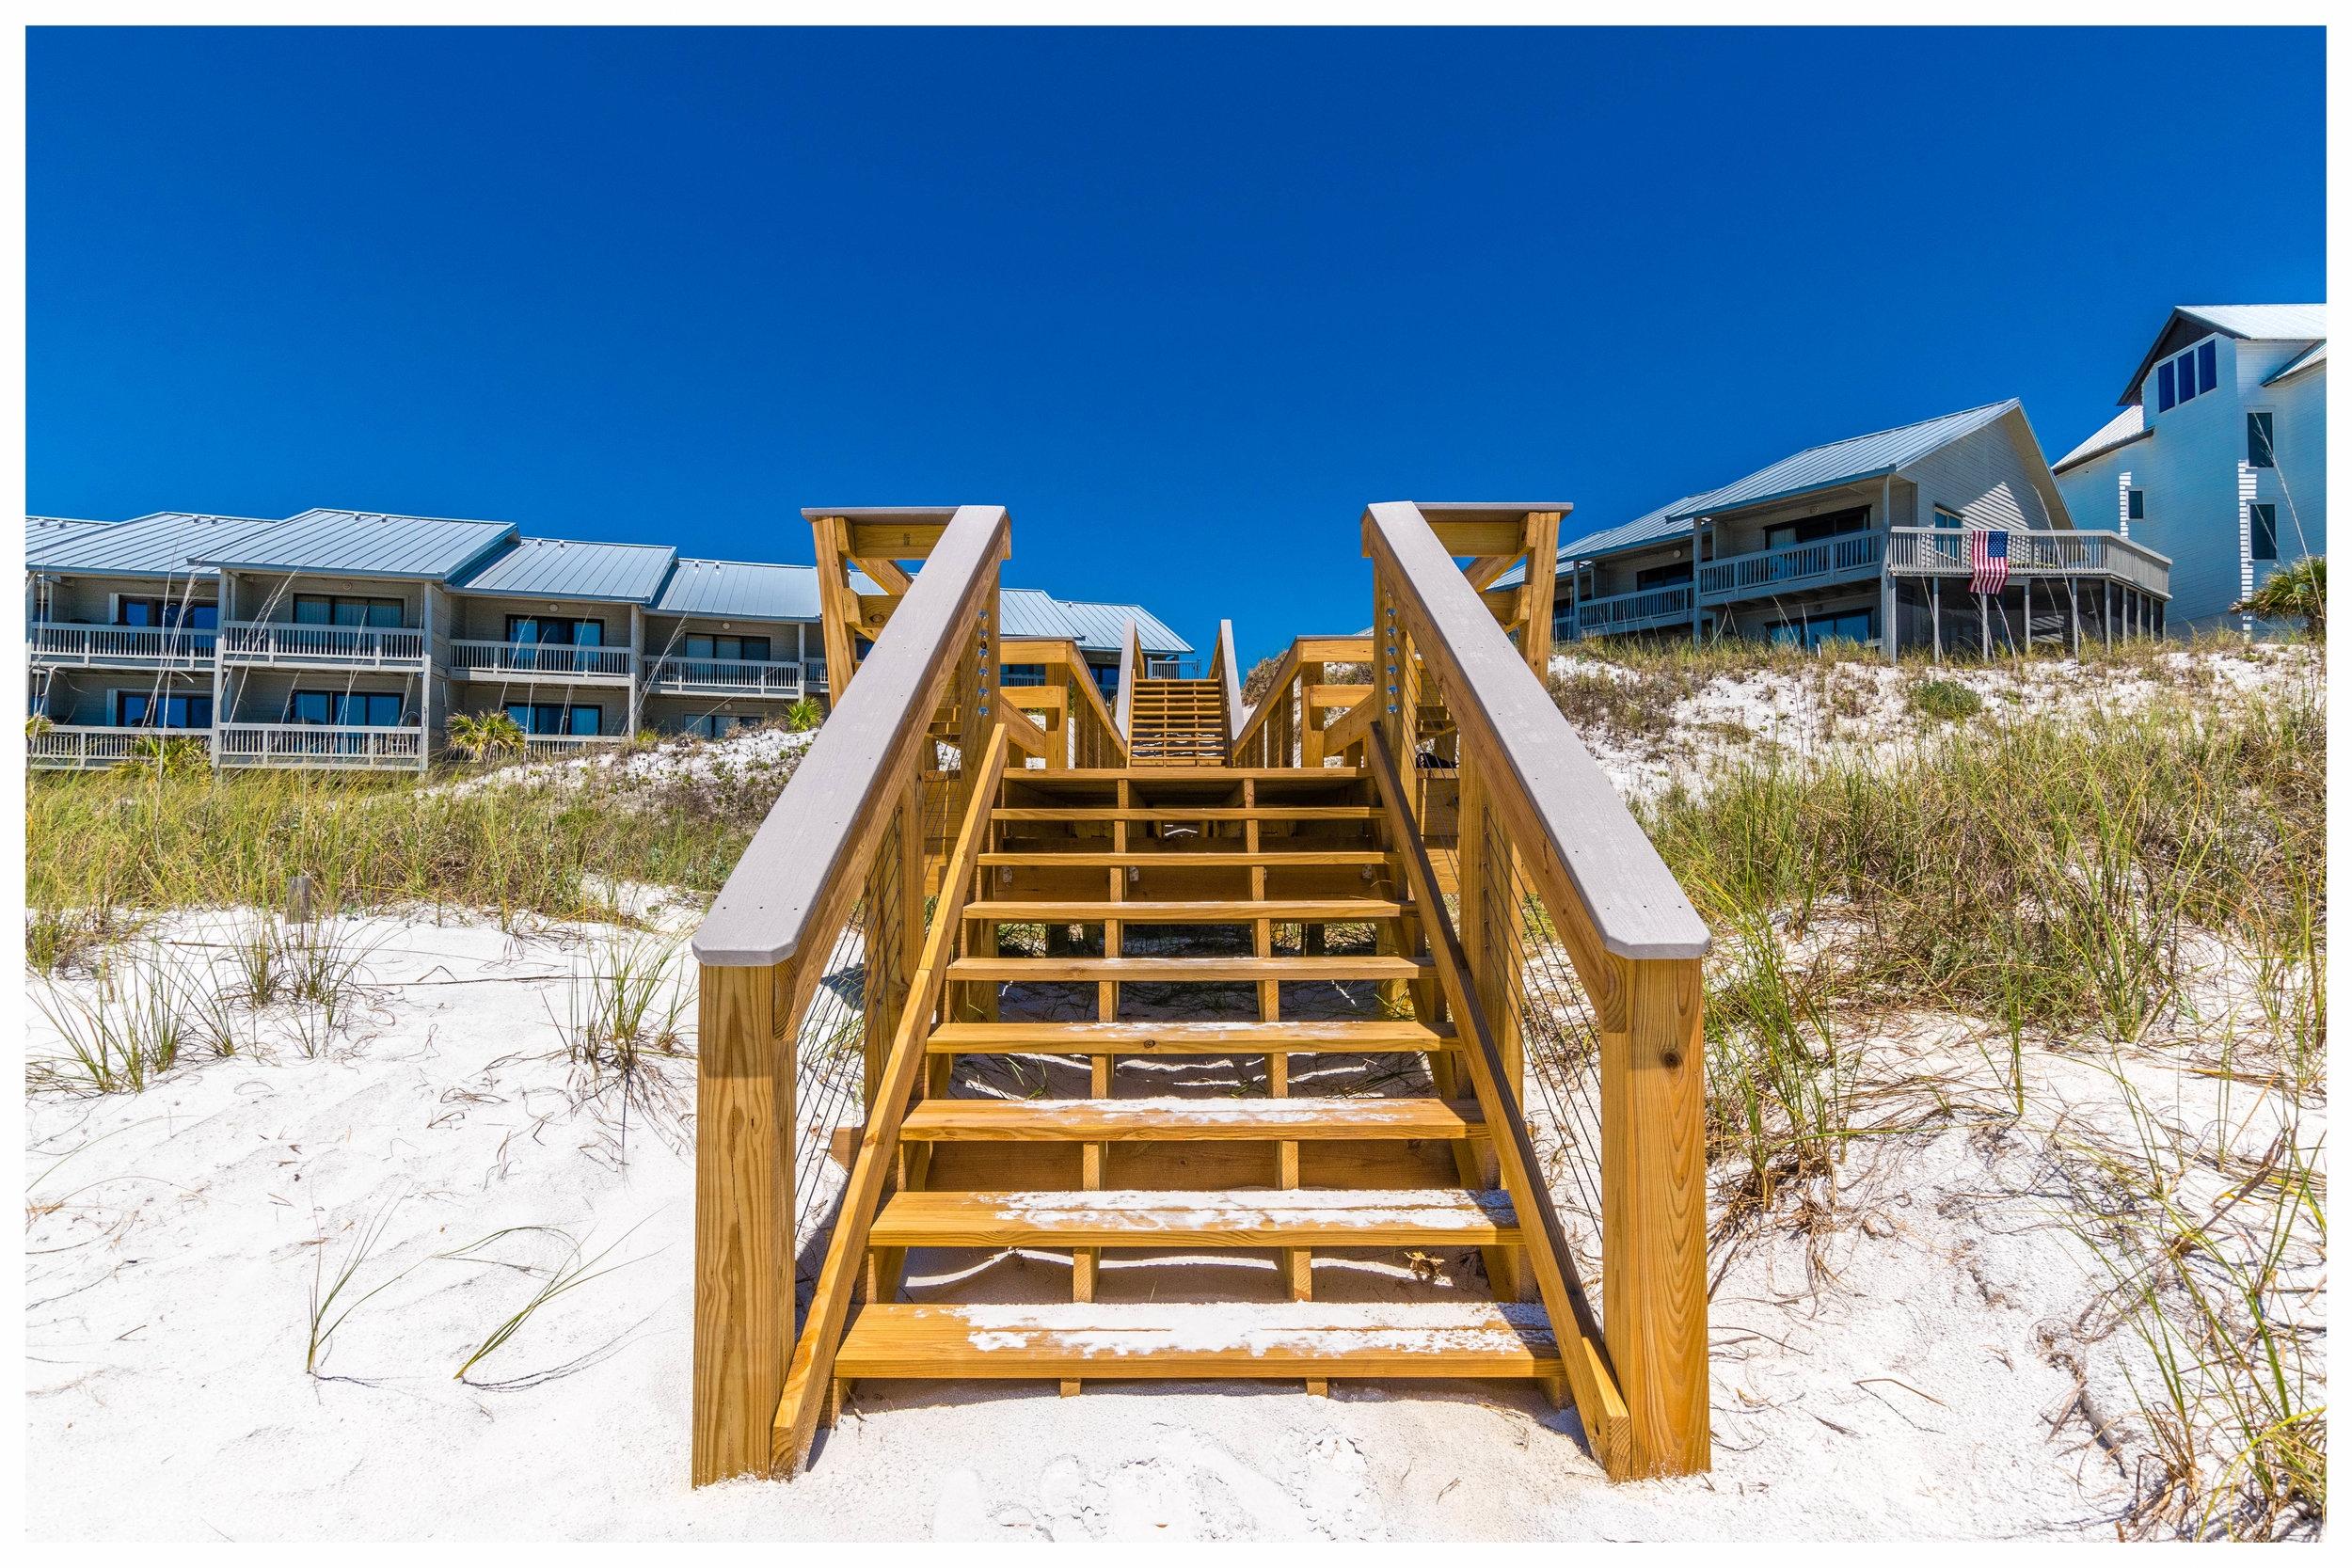 Wetland Boardwalk Construction Company